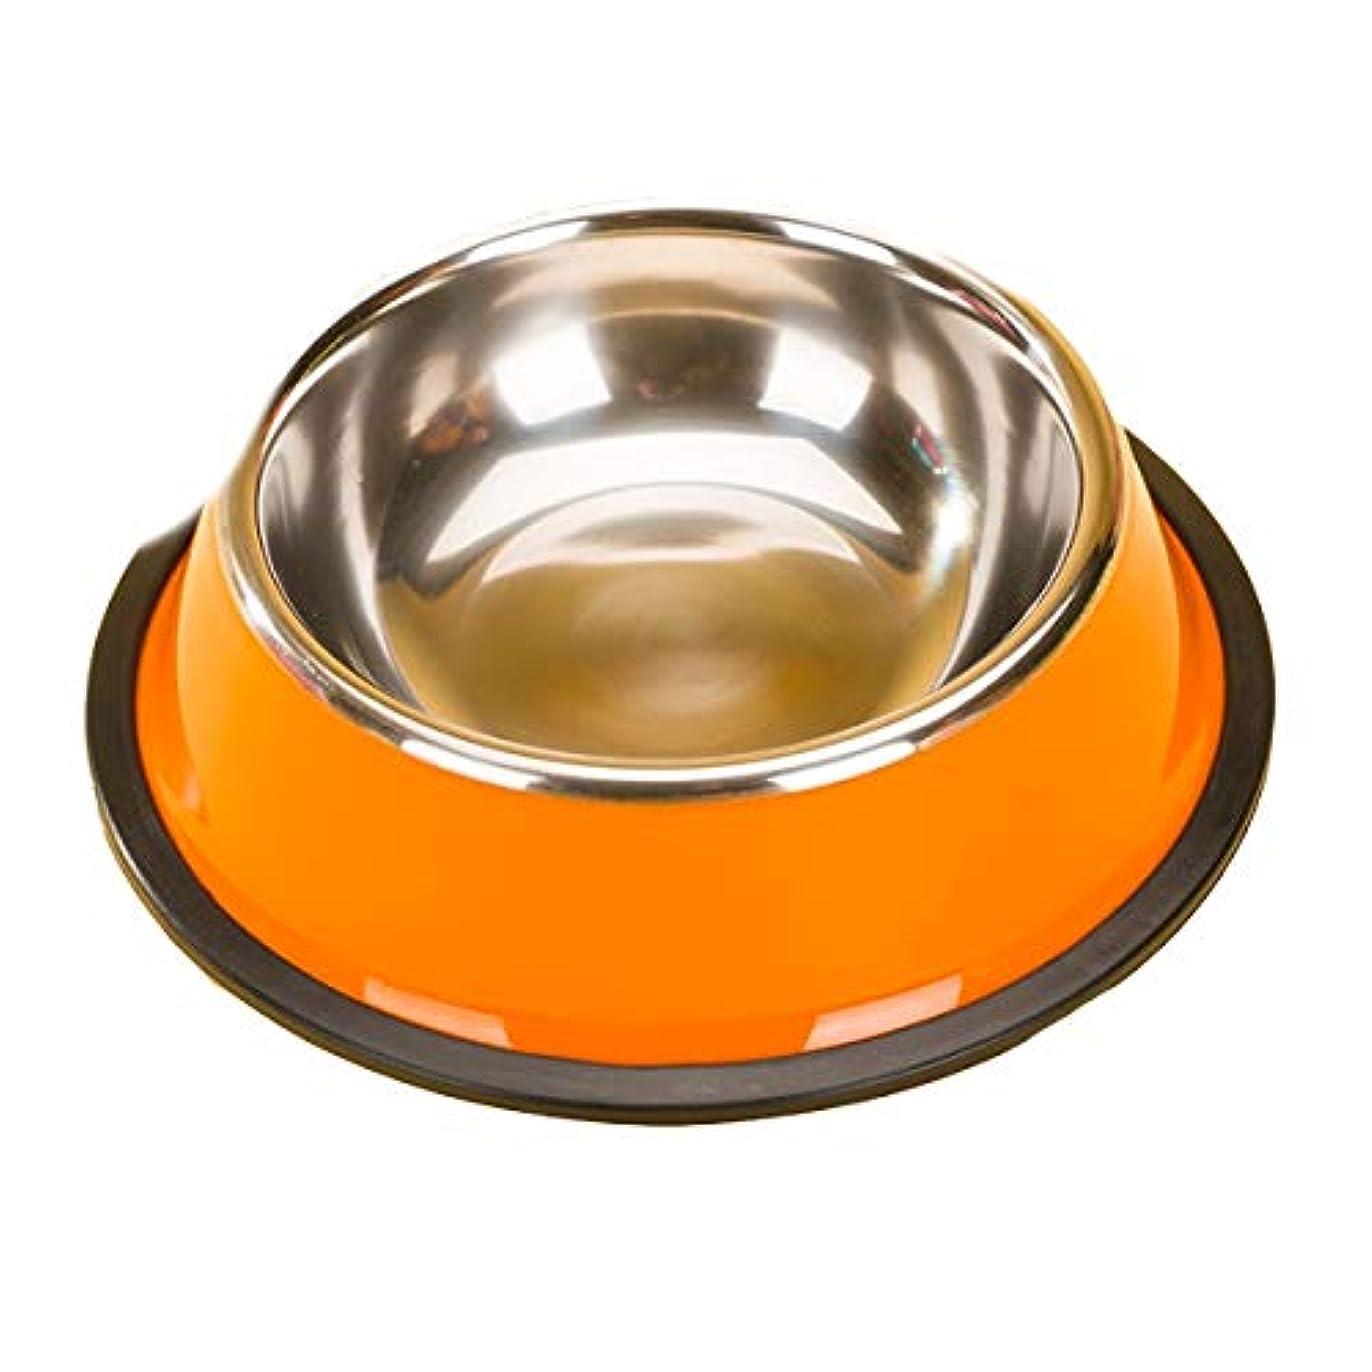 Xian 塗装ステンレススチール製フードボウル、ペットドッグ用品、子犬用ポット、ドッグボウルシングルボウル、塗装ステンレススチール製ペットボウル、単色、3オプション Easy to Clean Non-Skid Bowls for Dogs (Color : Orange, Size : S)